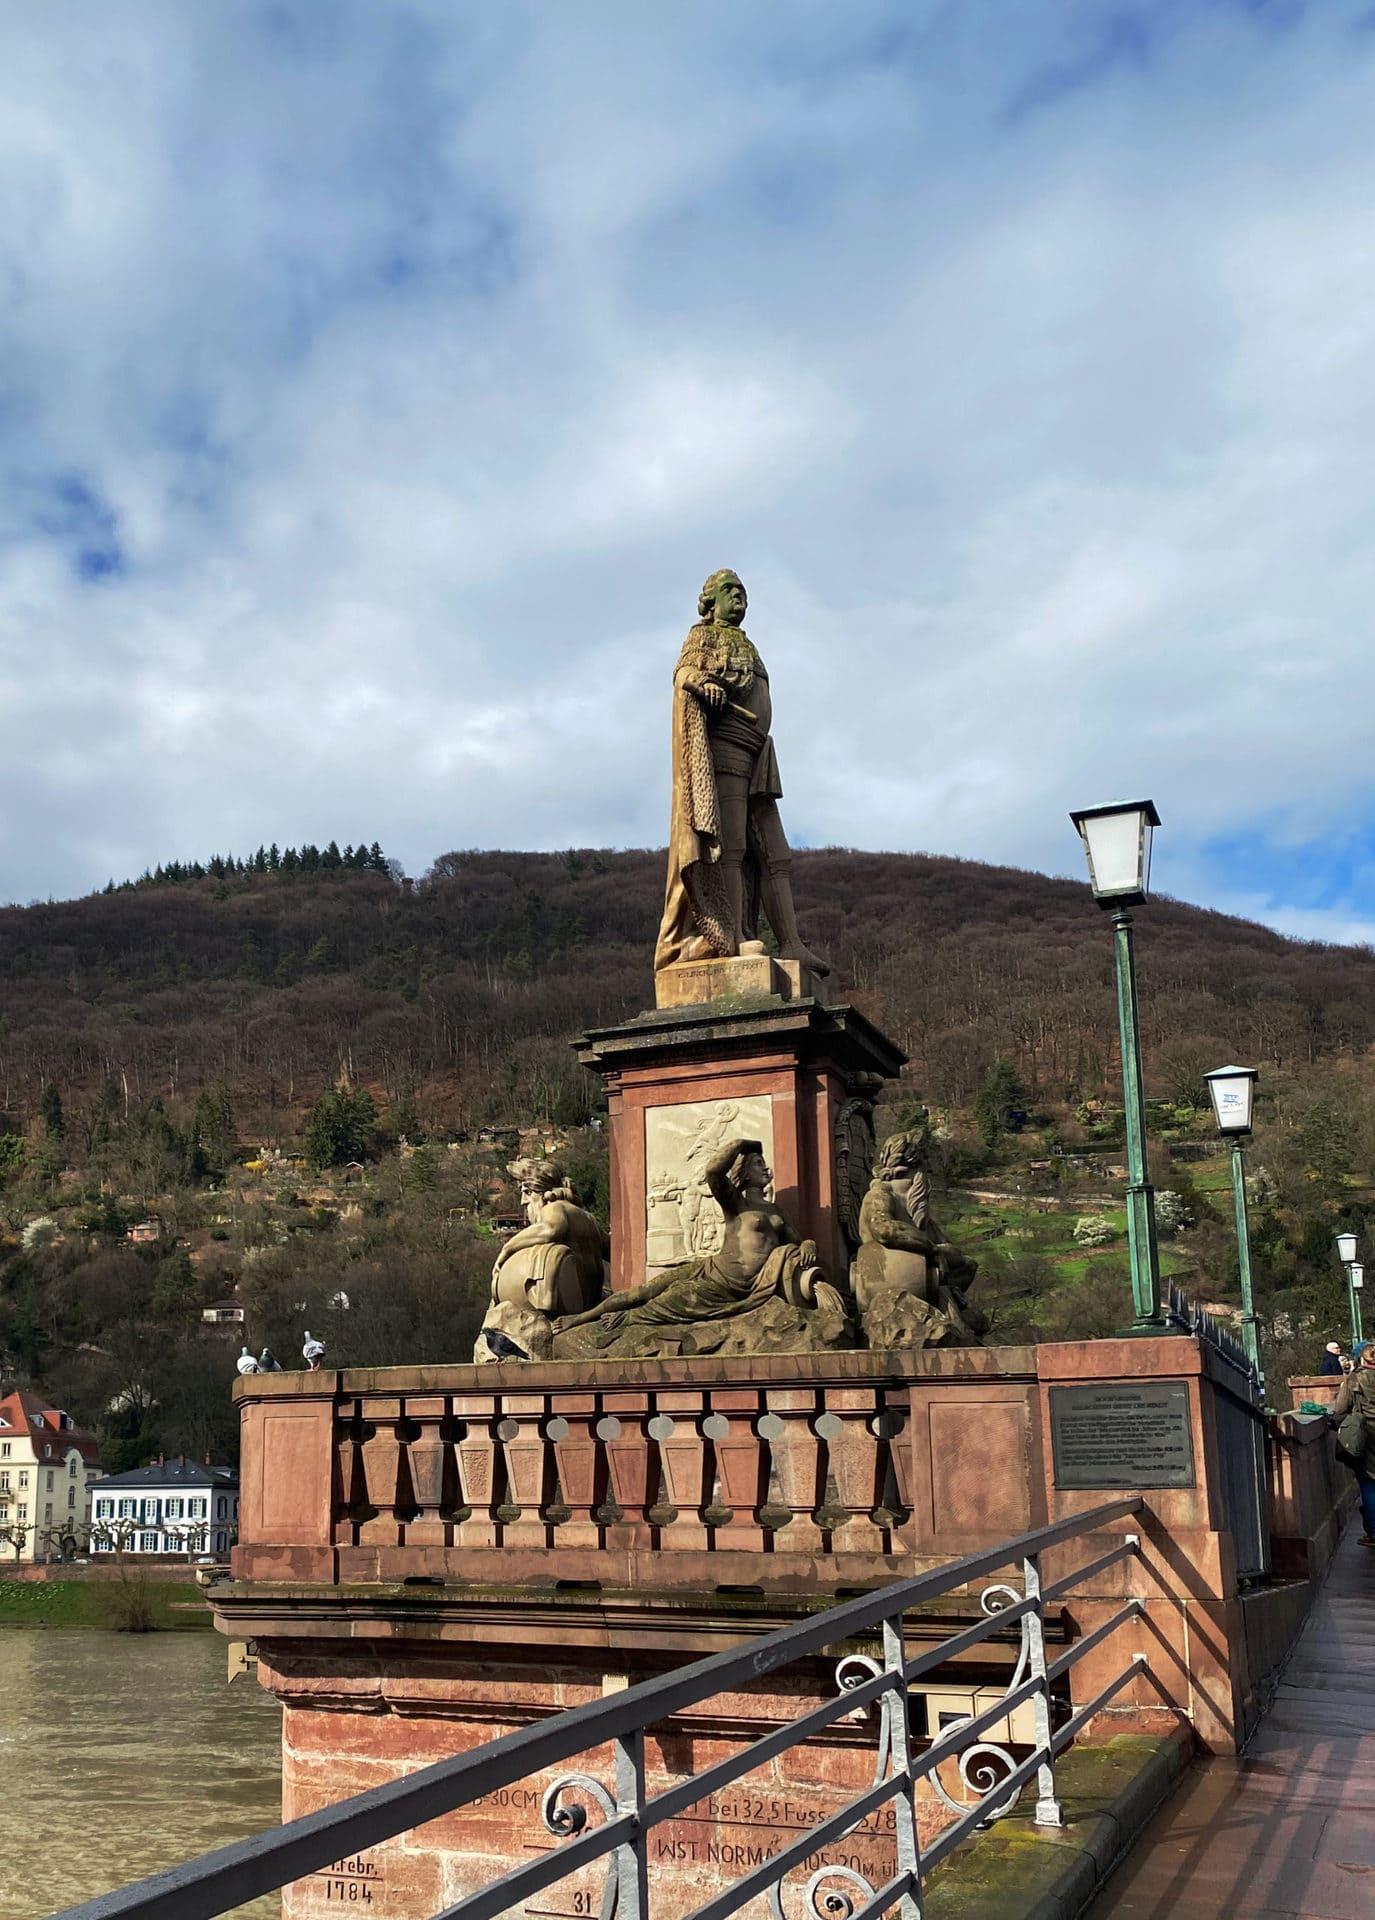 Karl Theodor Statue